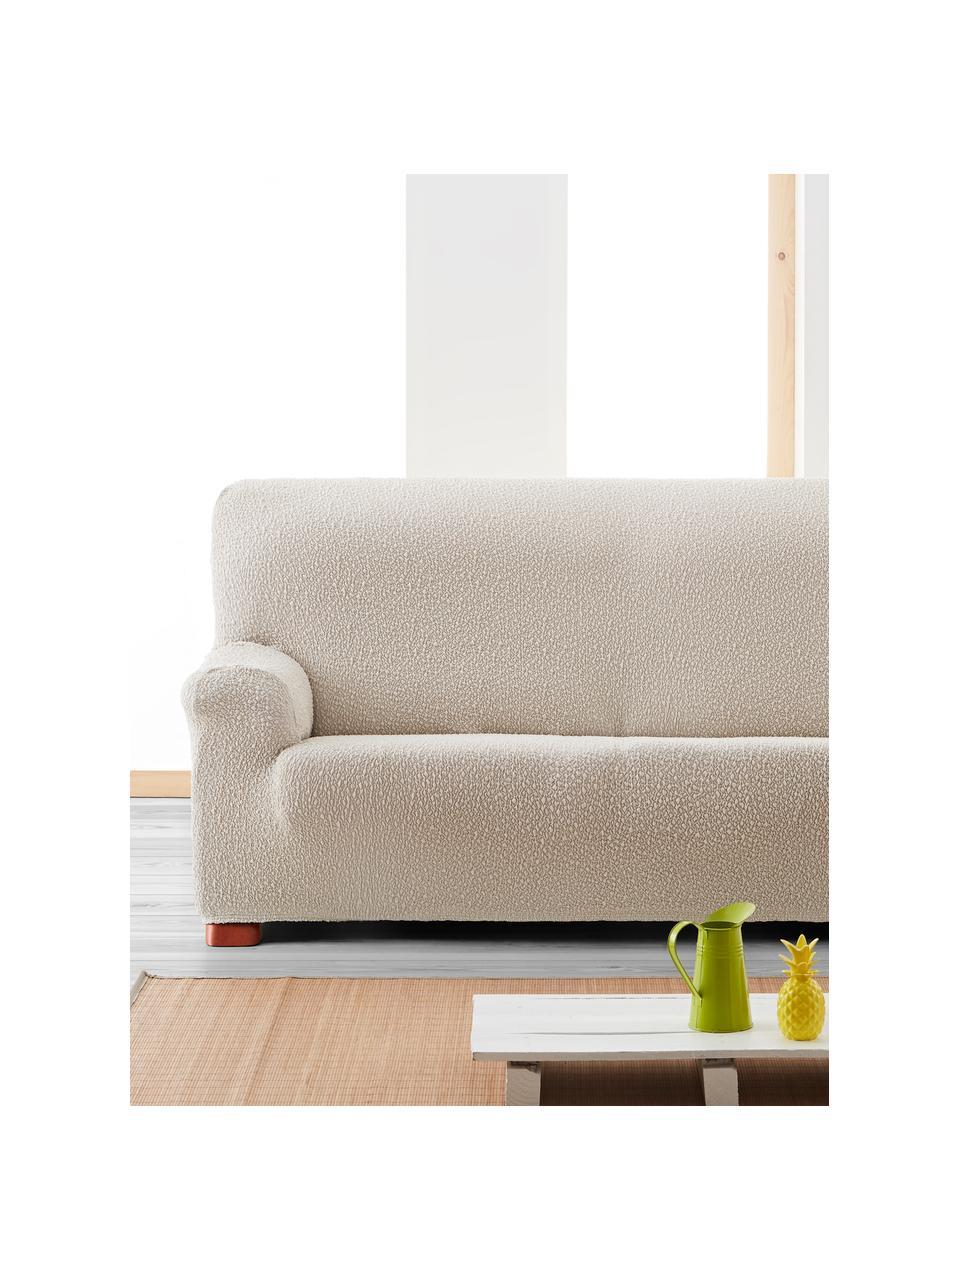 Copertura divano Roc, 55% poliestere, 35% cotone, 10% elastomero, Color crema, Larg. 200 x Alt. 120 cm